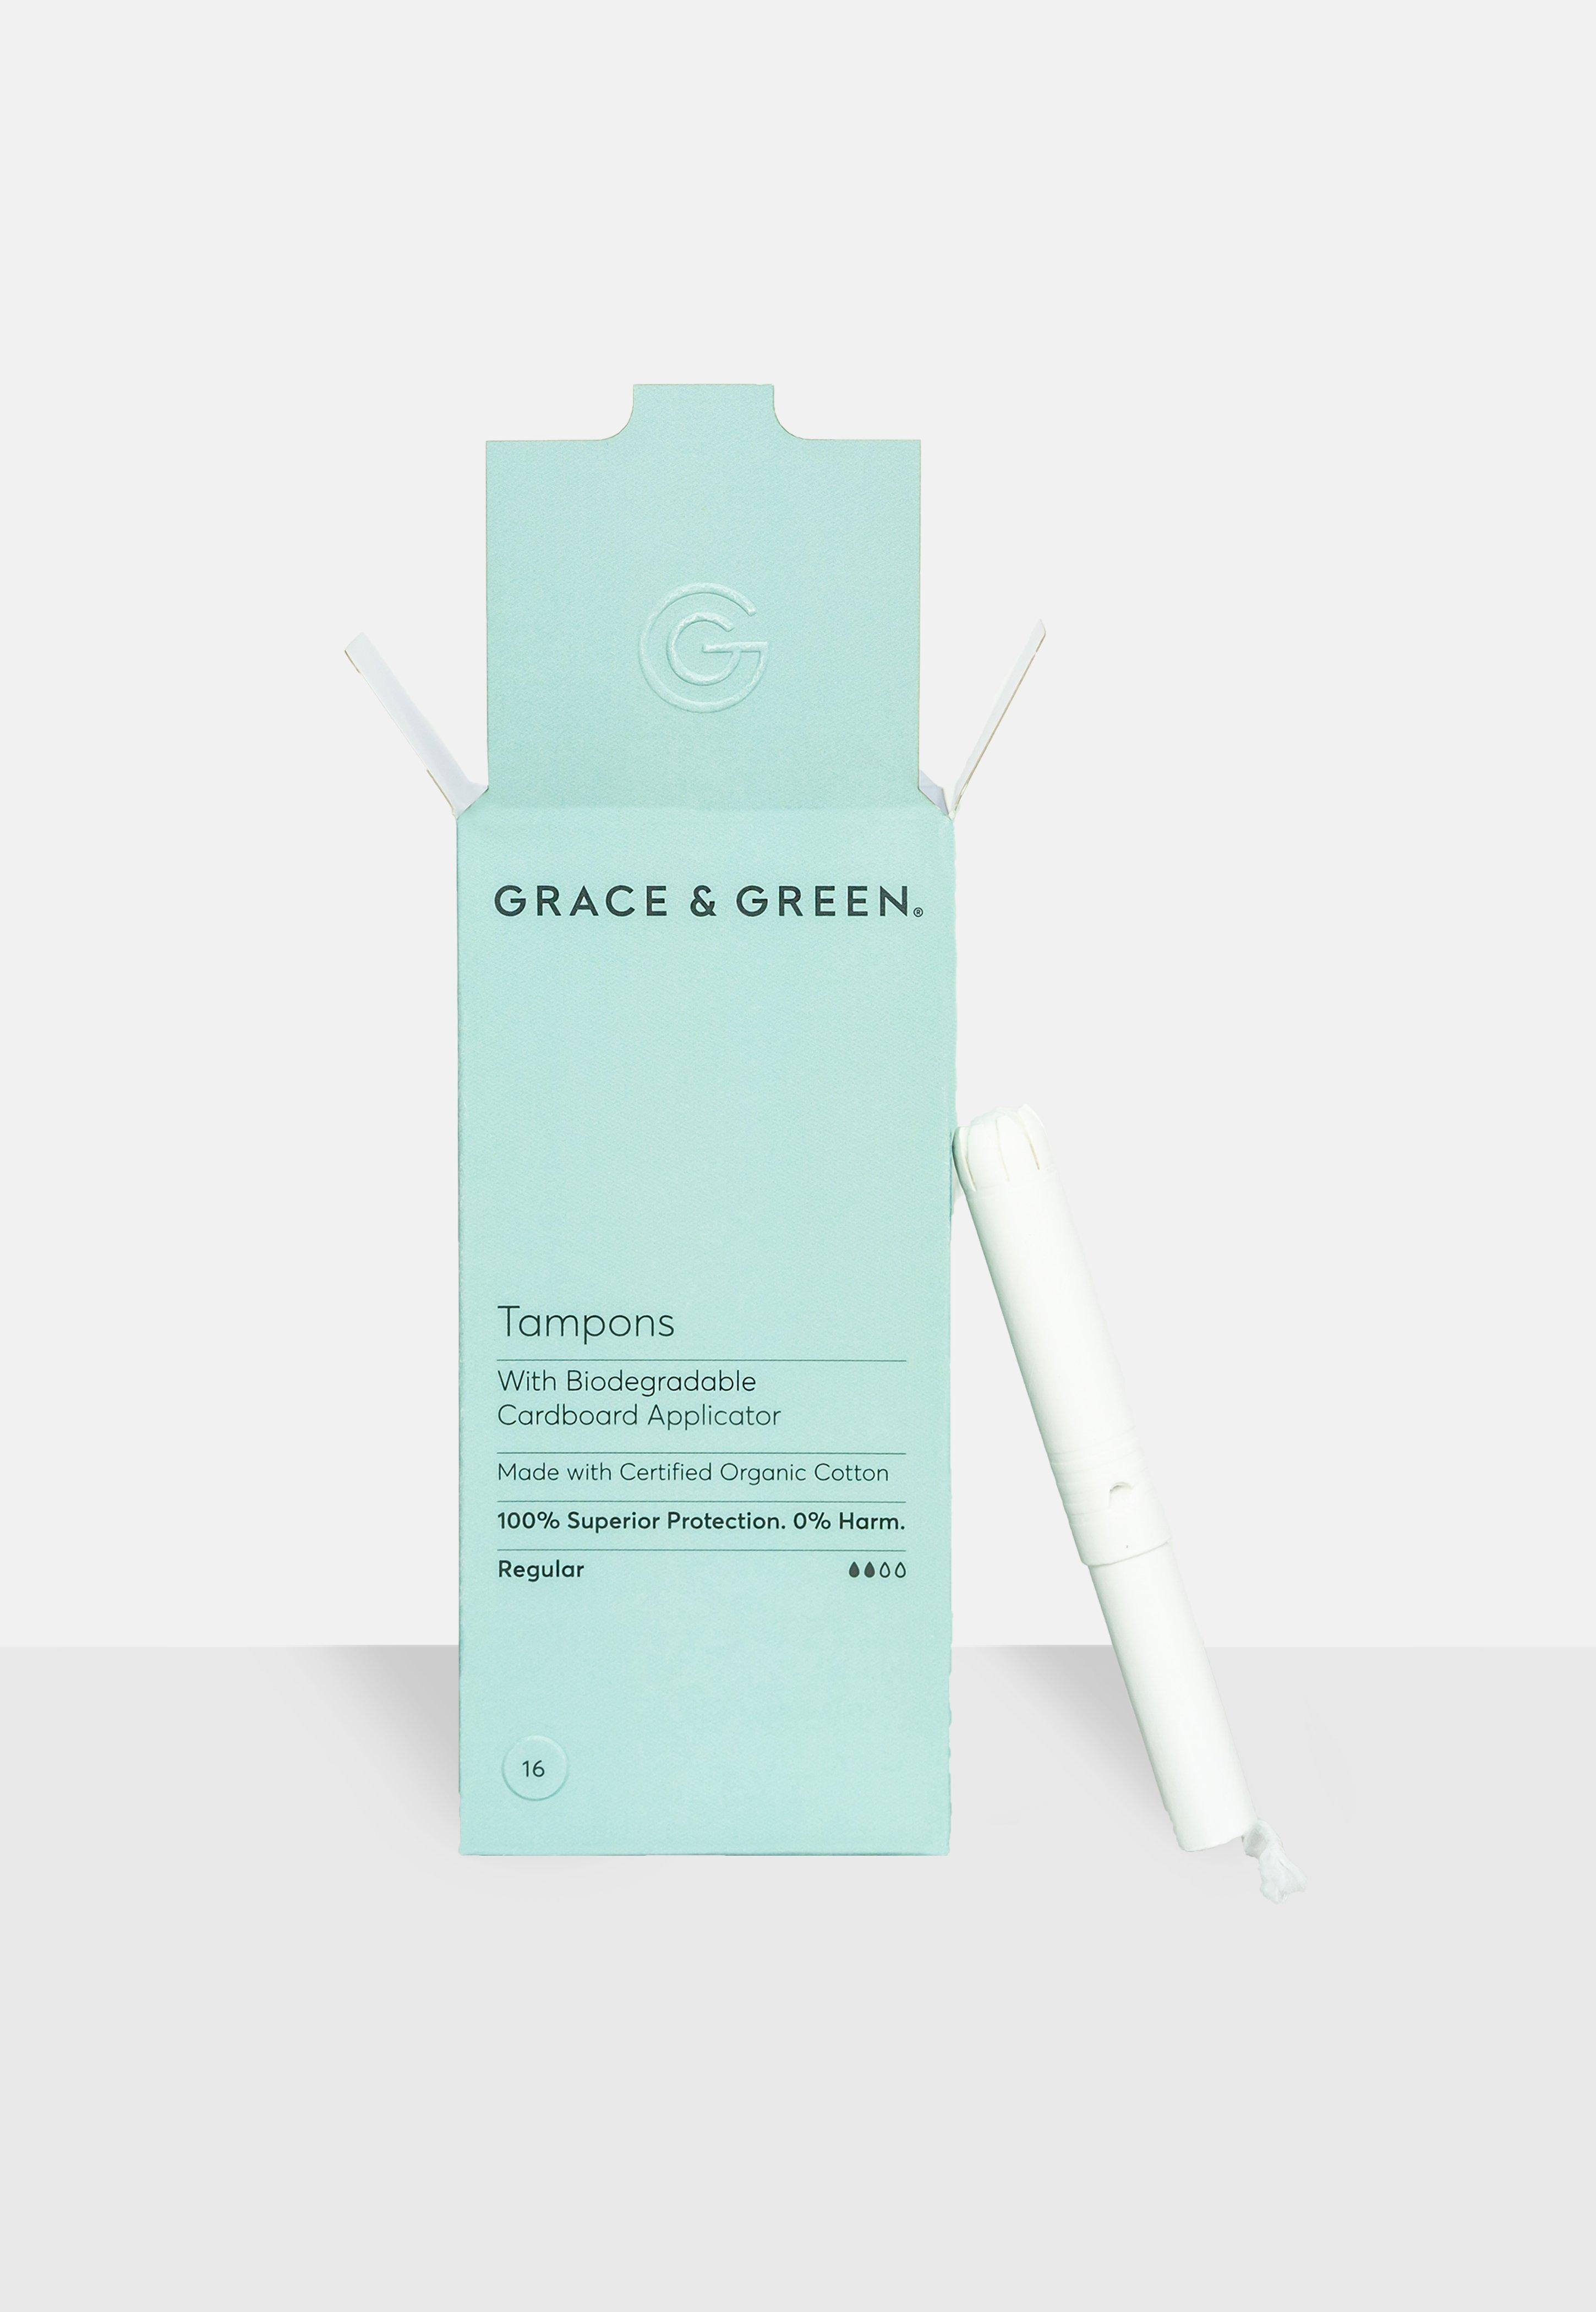 Grace & Green Regular Tampons